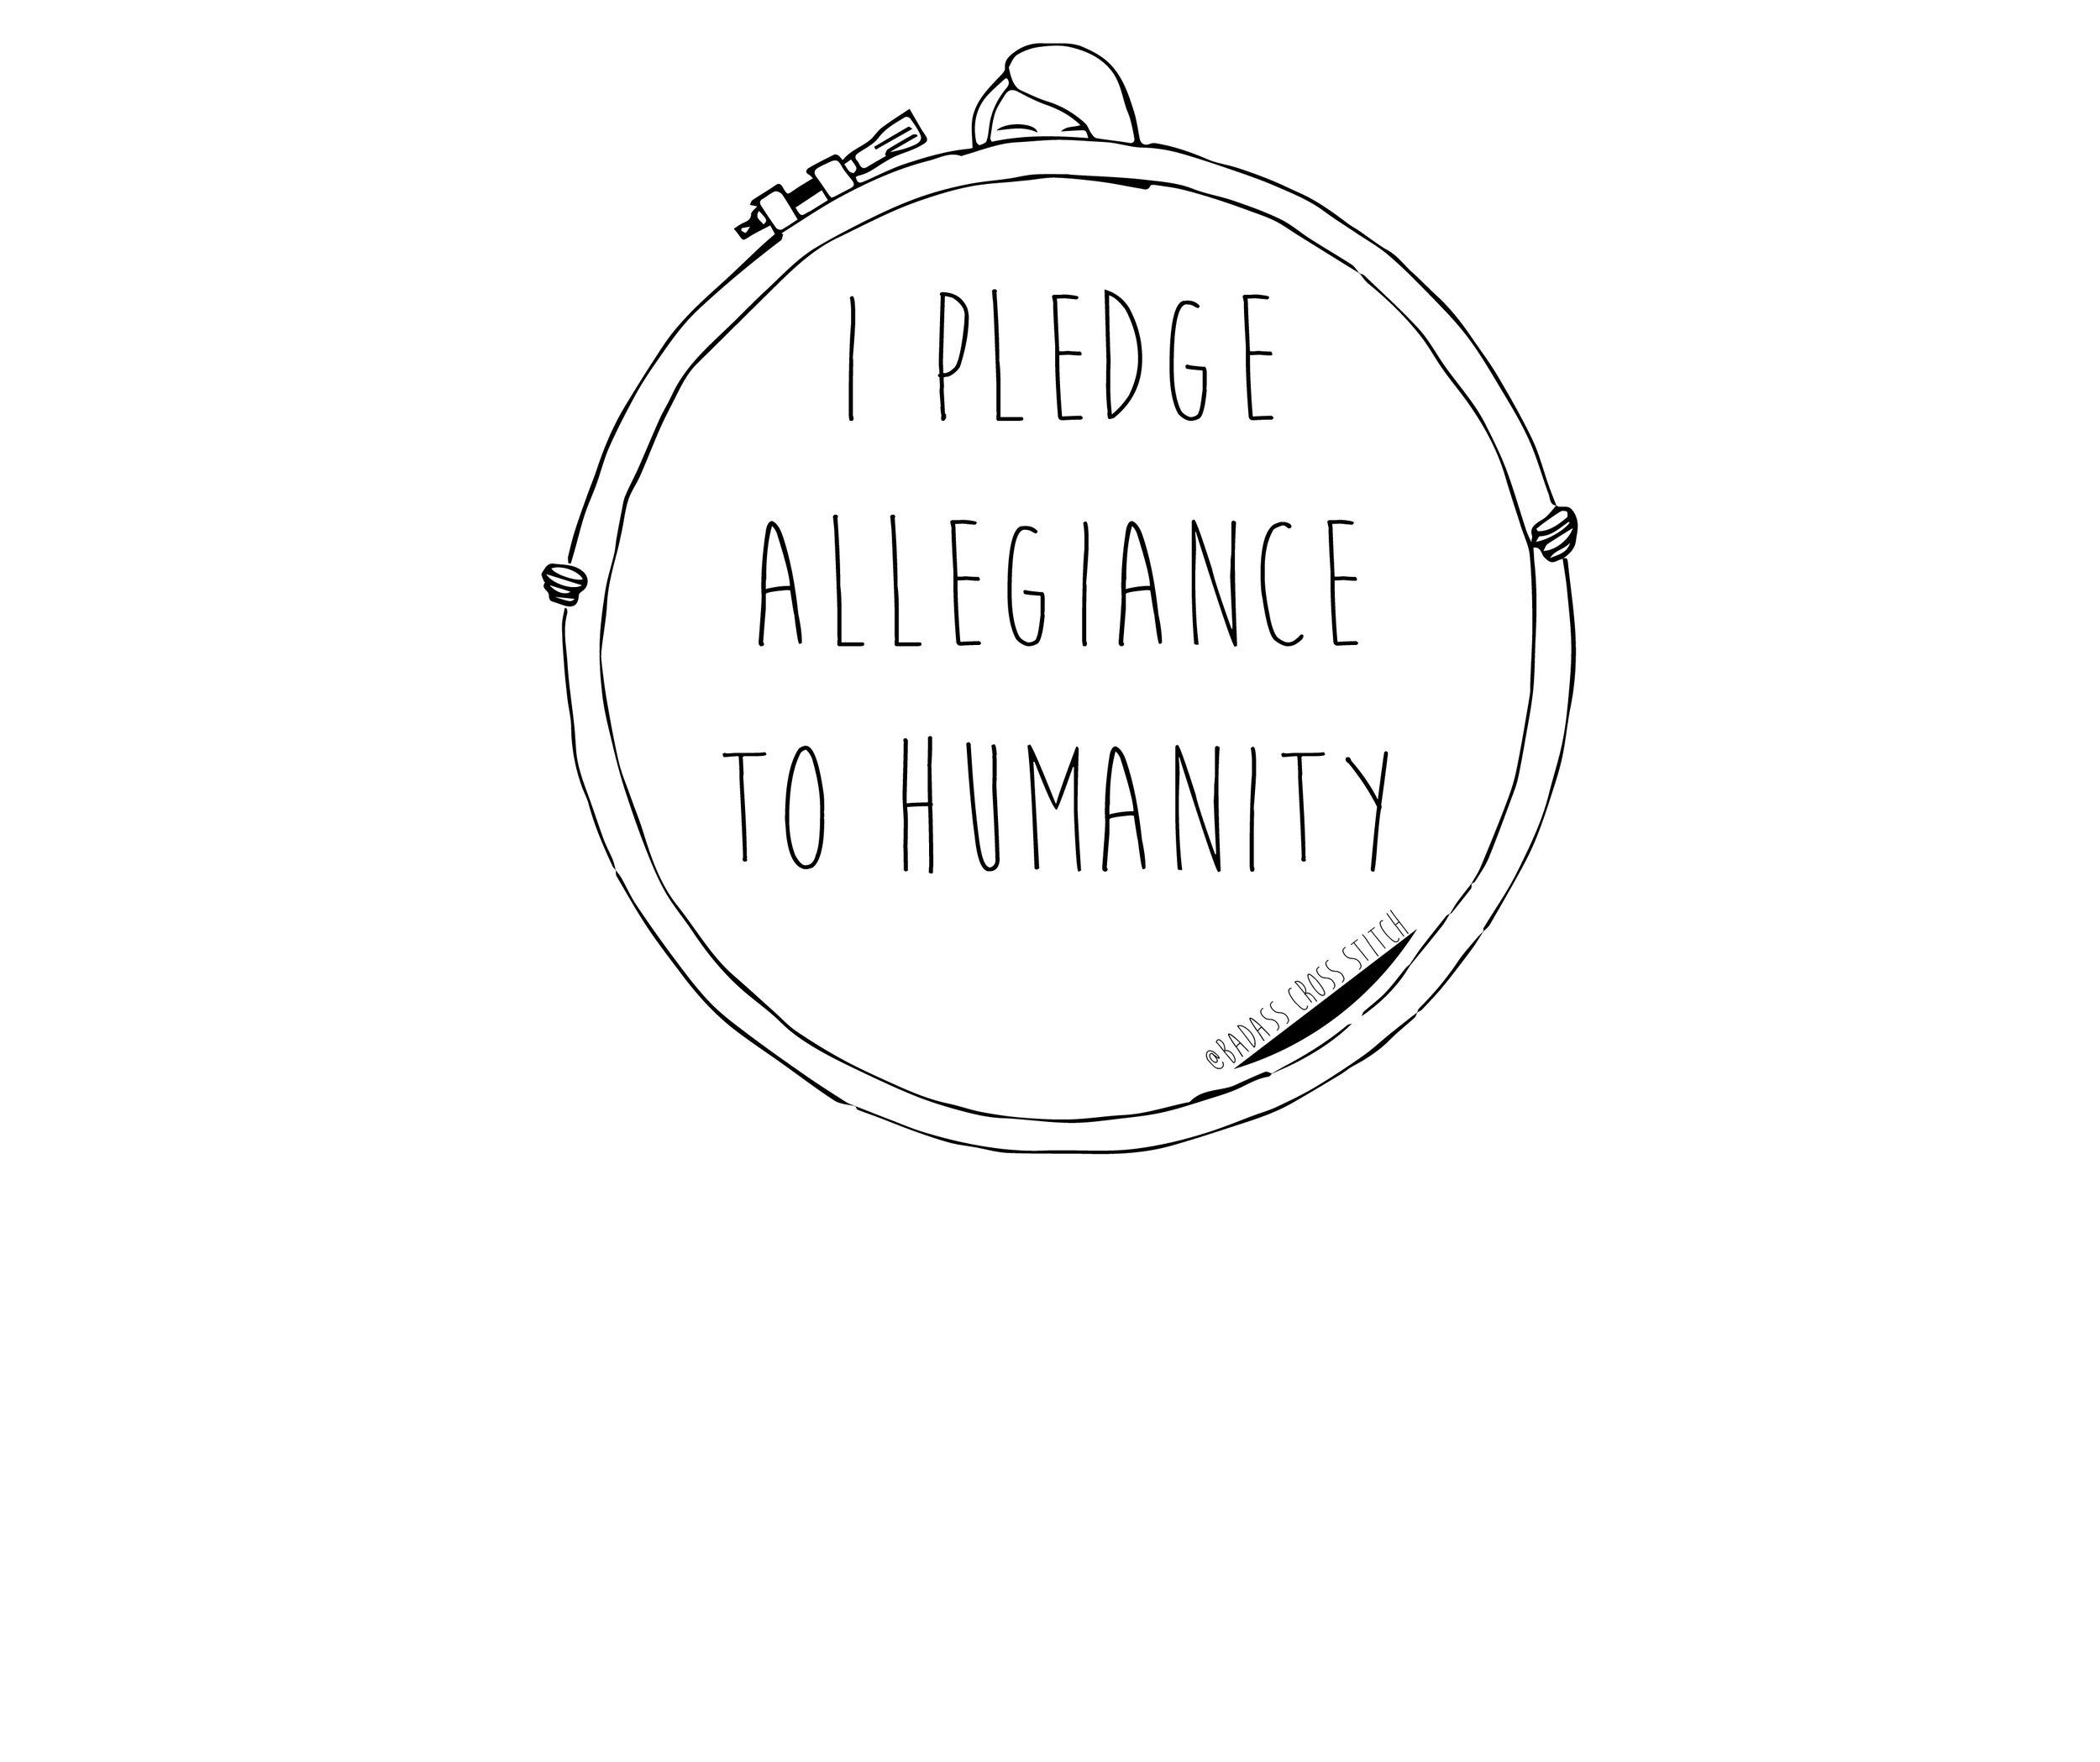 tinyshannonround-pledge.jpg